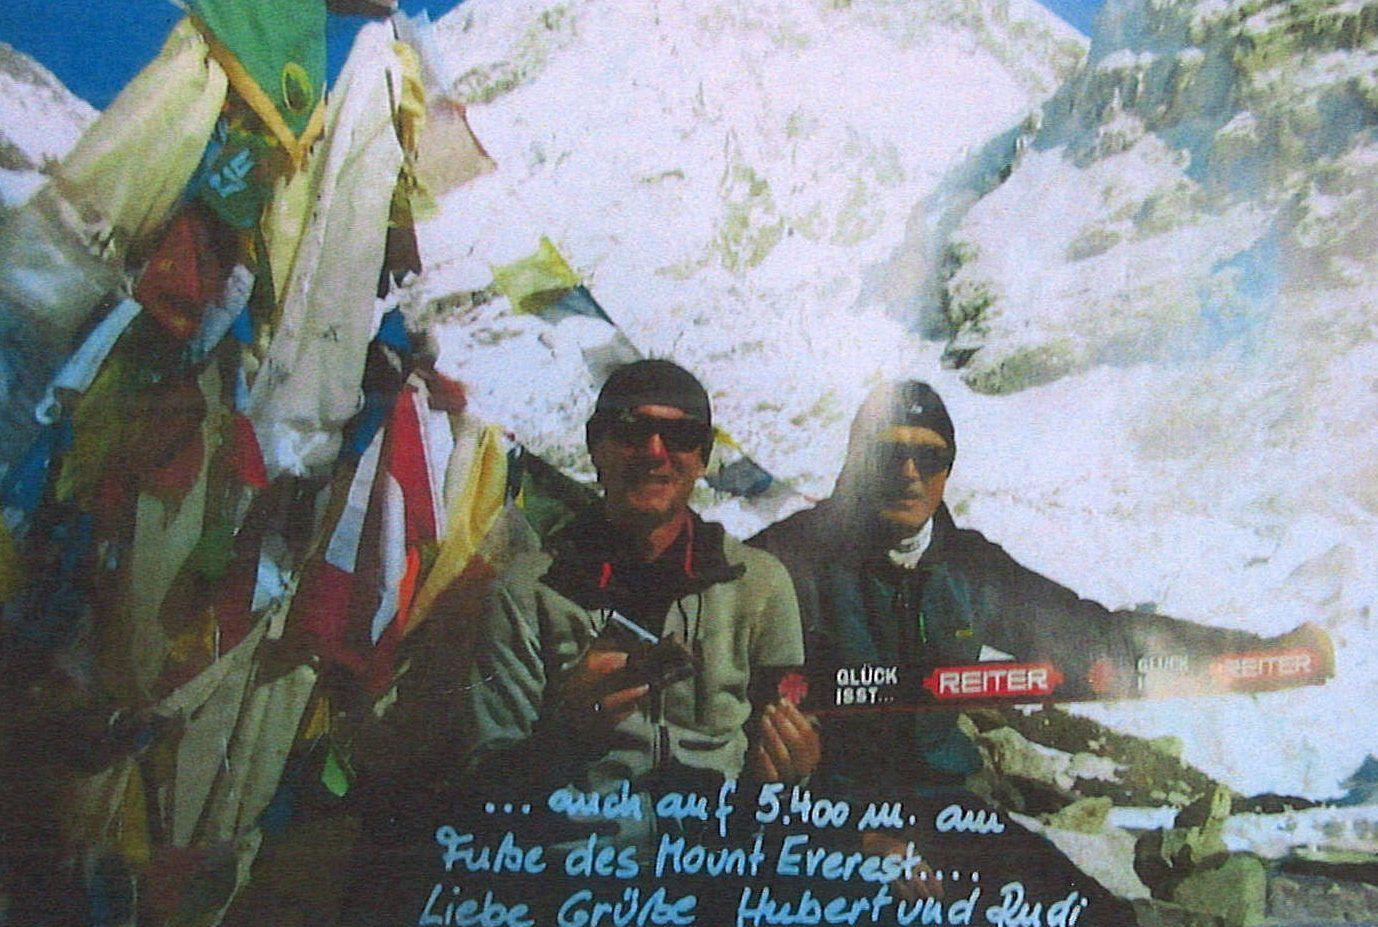 Dr. Achleitner auf dem Mount Everest 2013